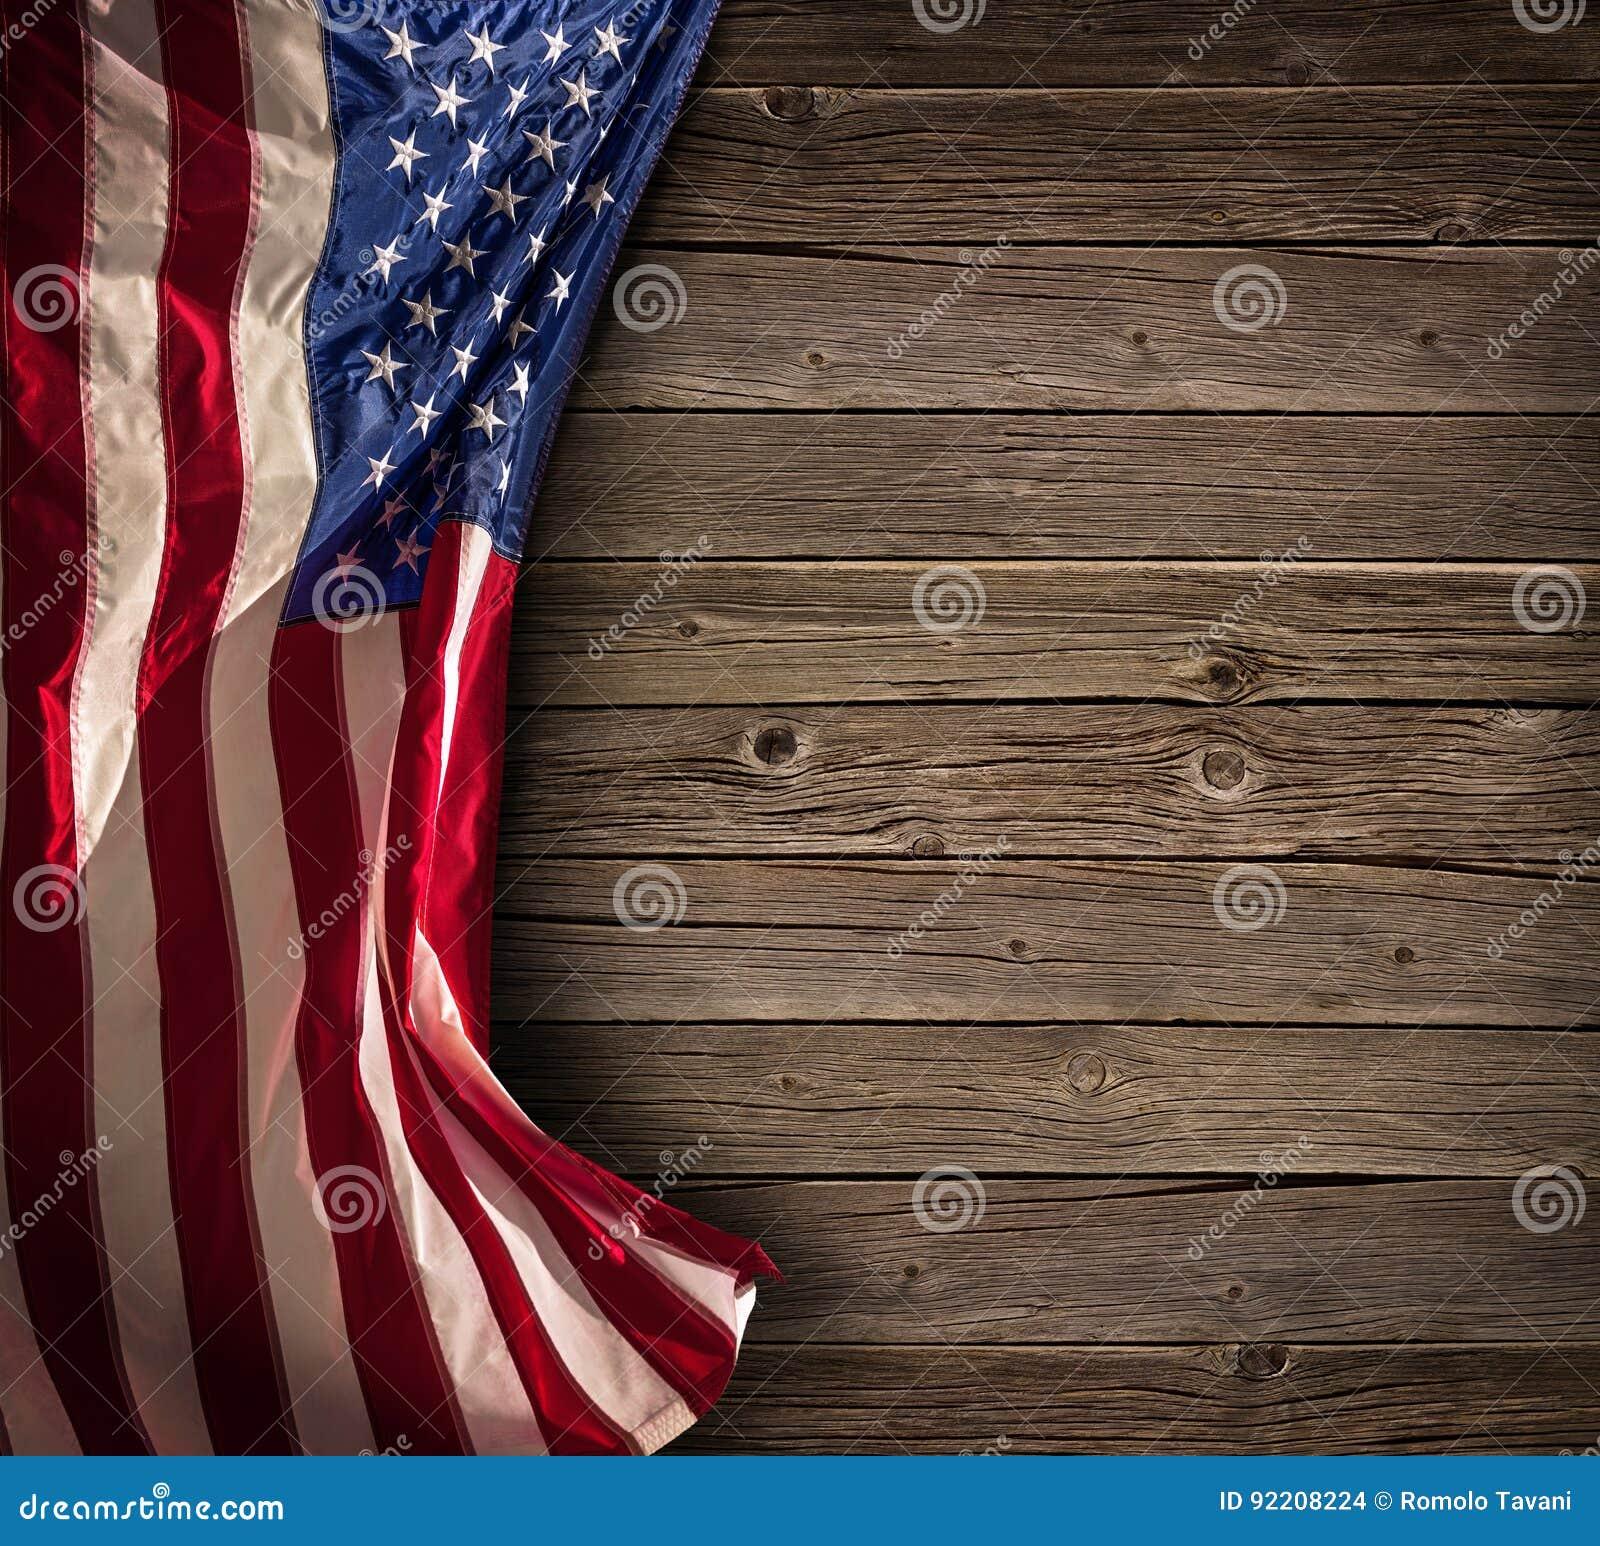 Patriotic American Celebration - Aged Usa Flag